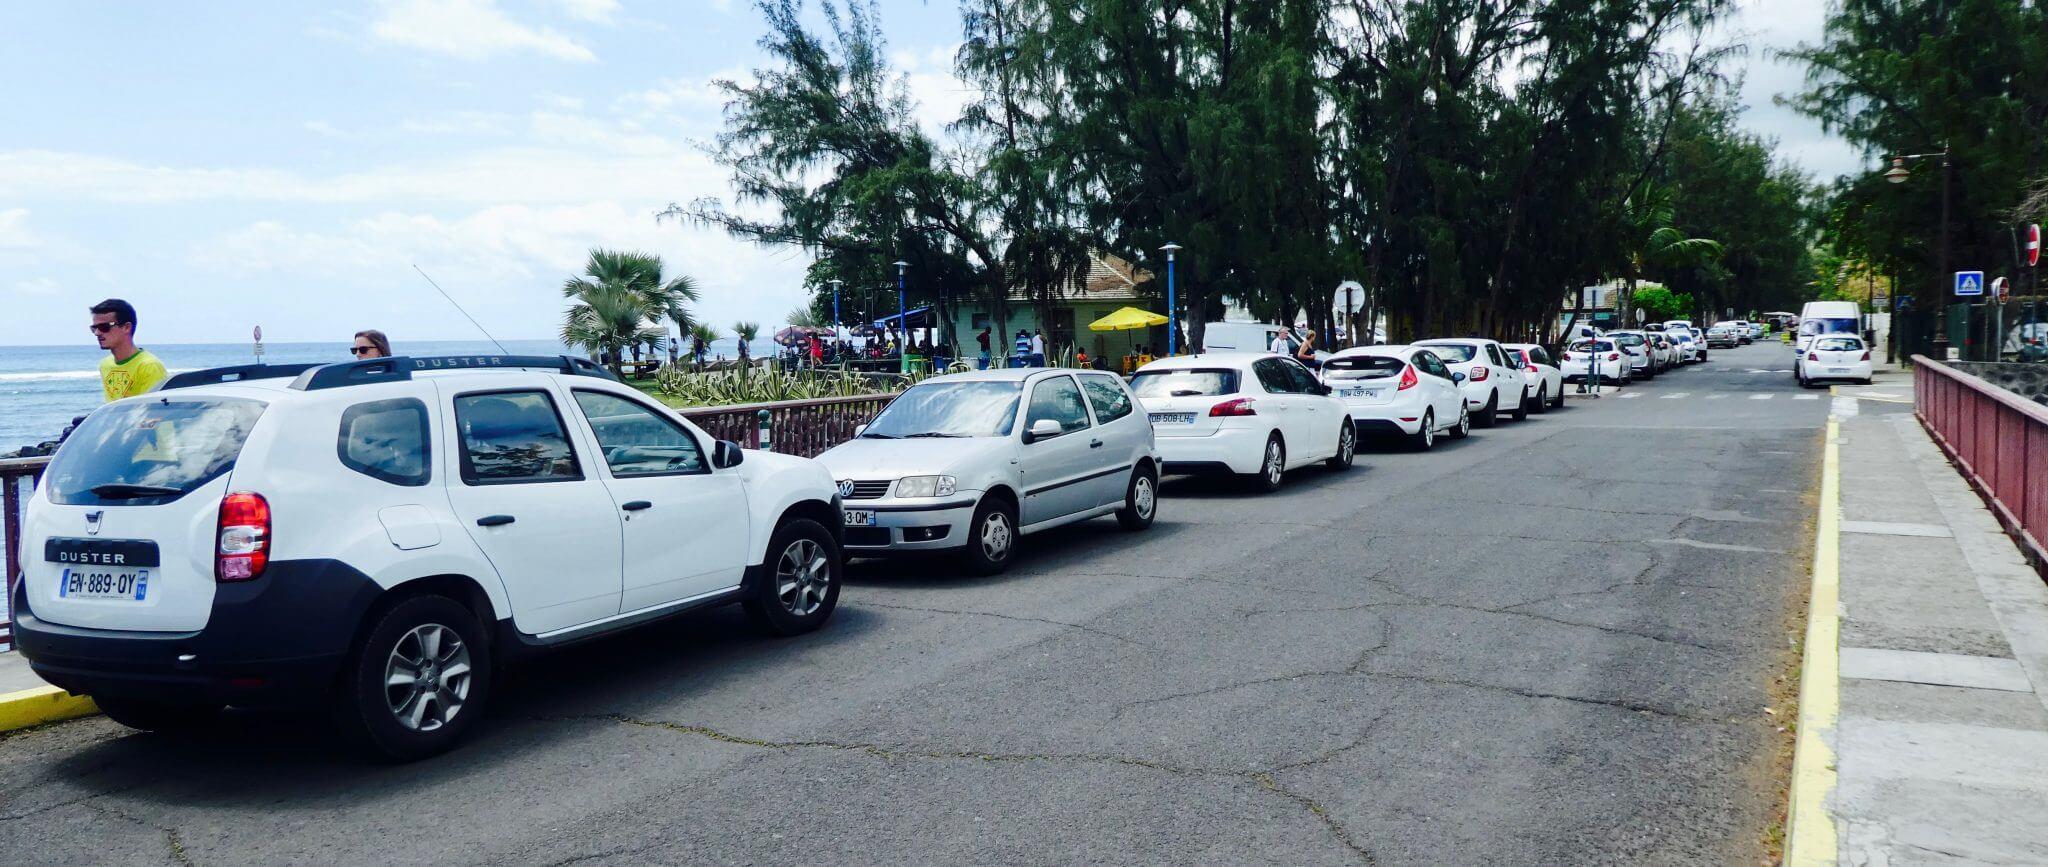 infos insolites réunion voitures blanches